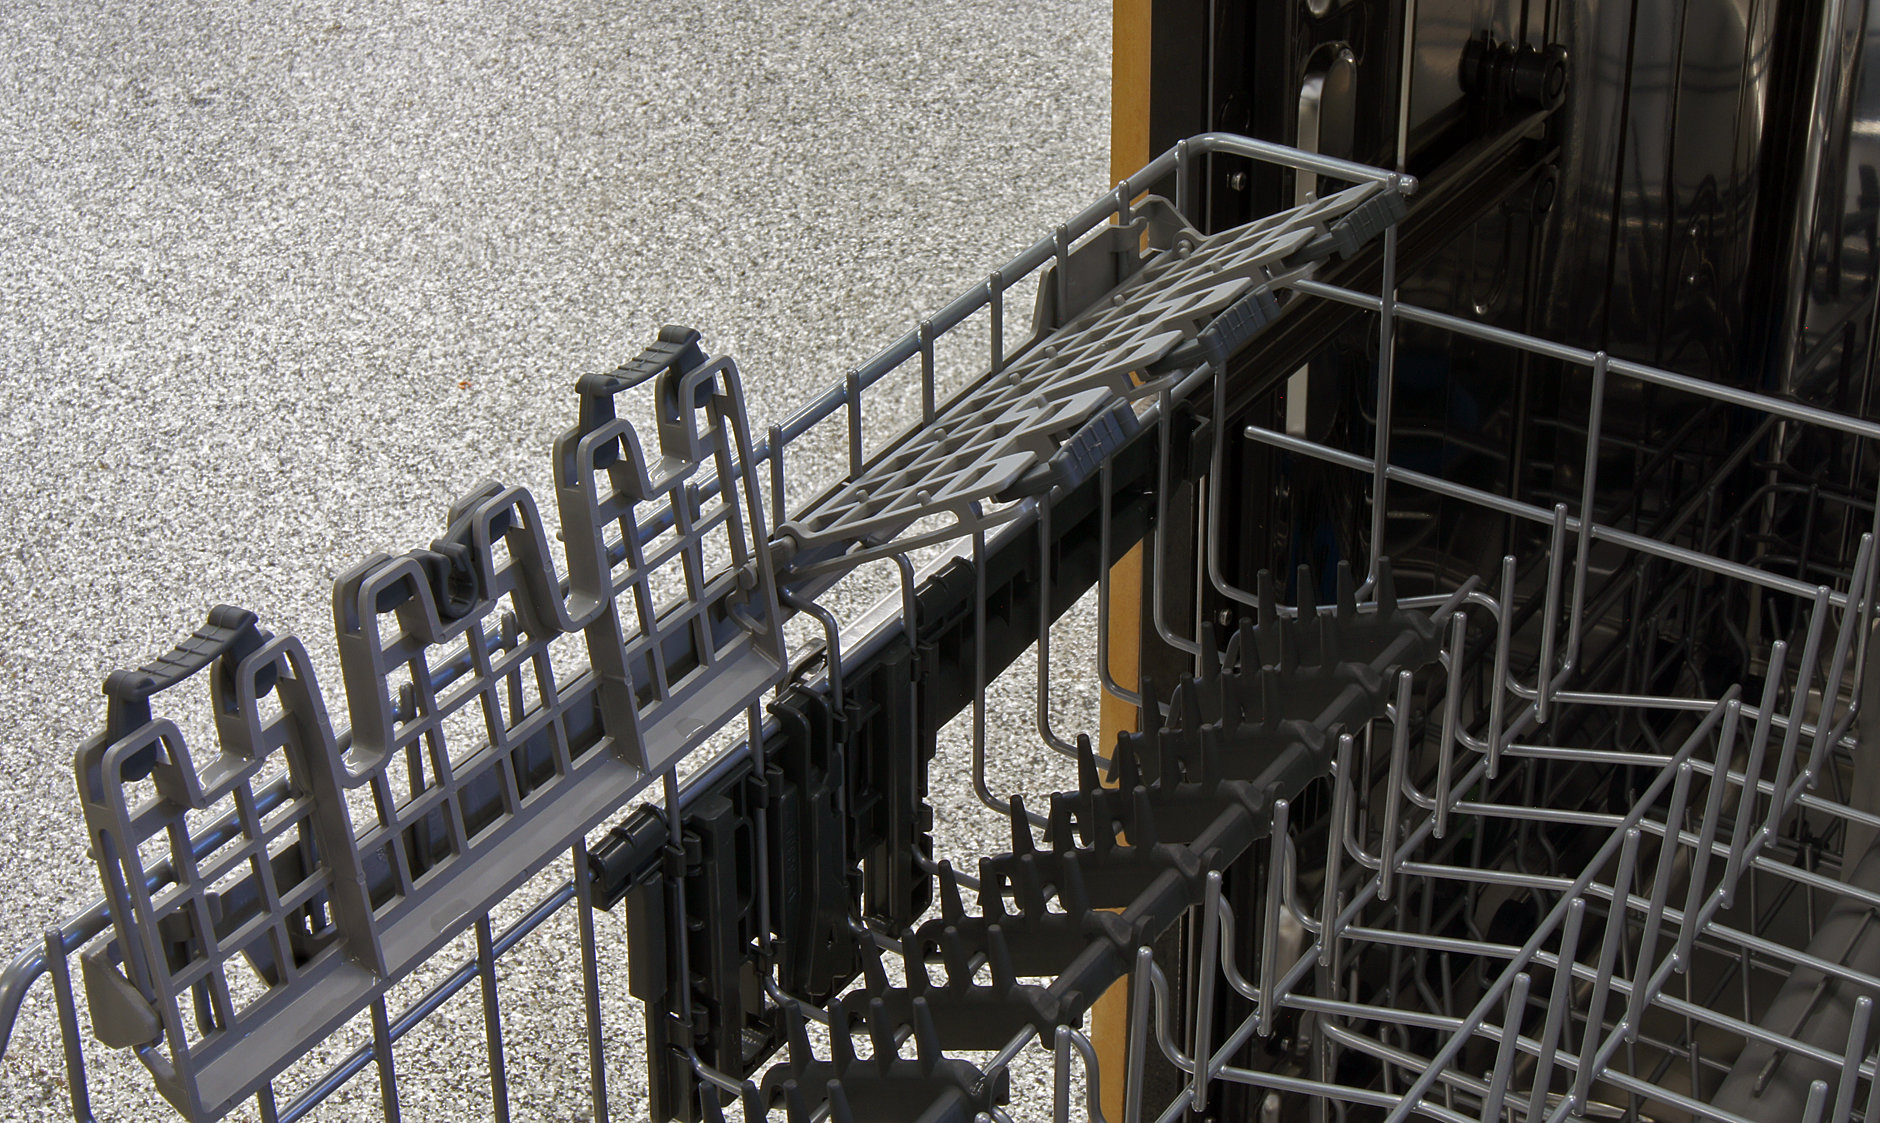 Frigidaire Gallery FGID2474QS stemware clip